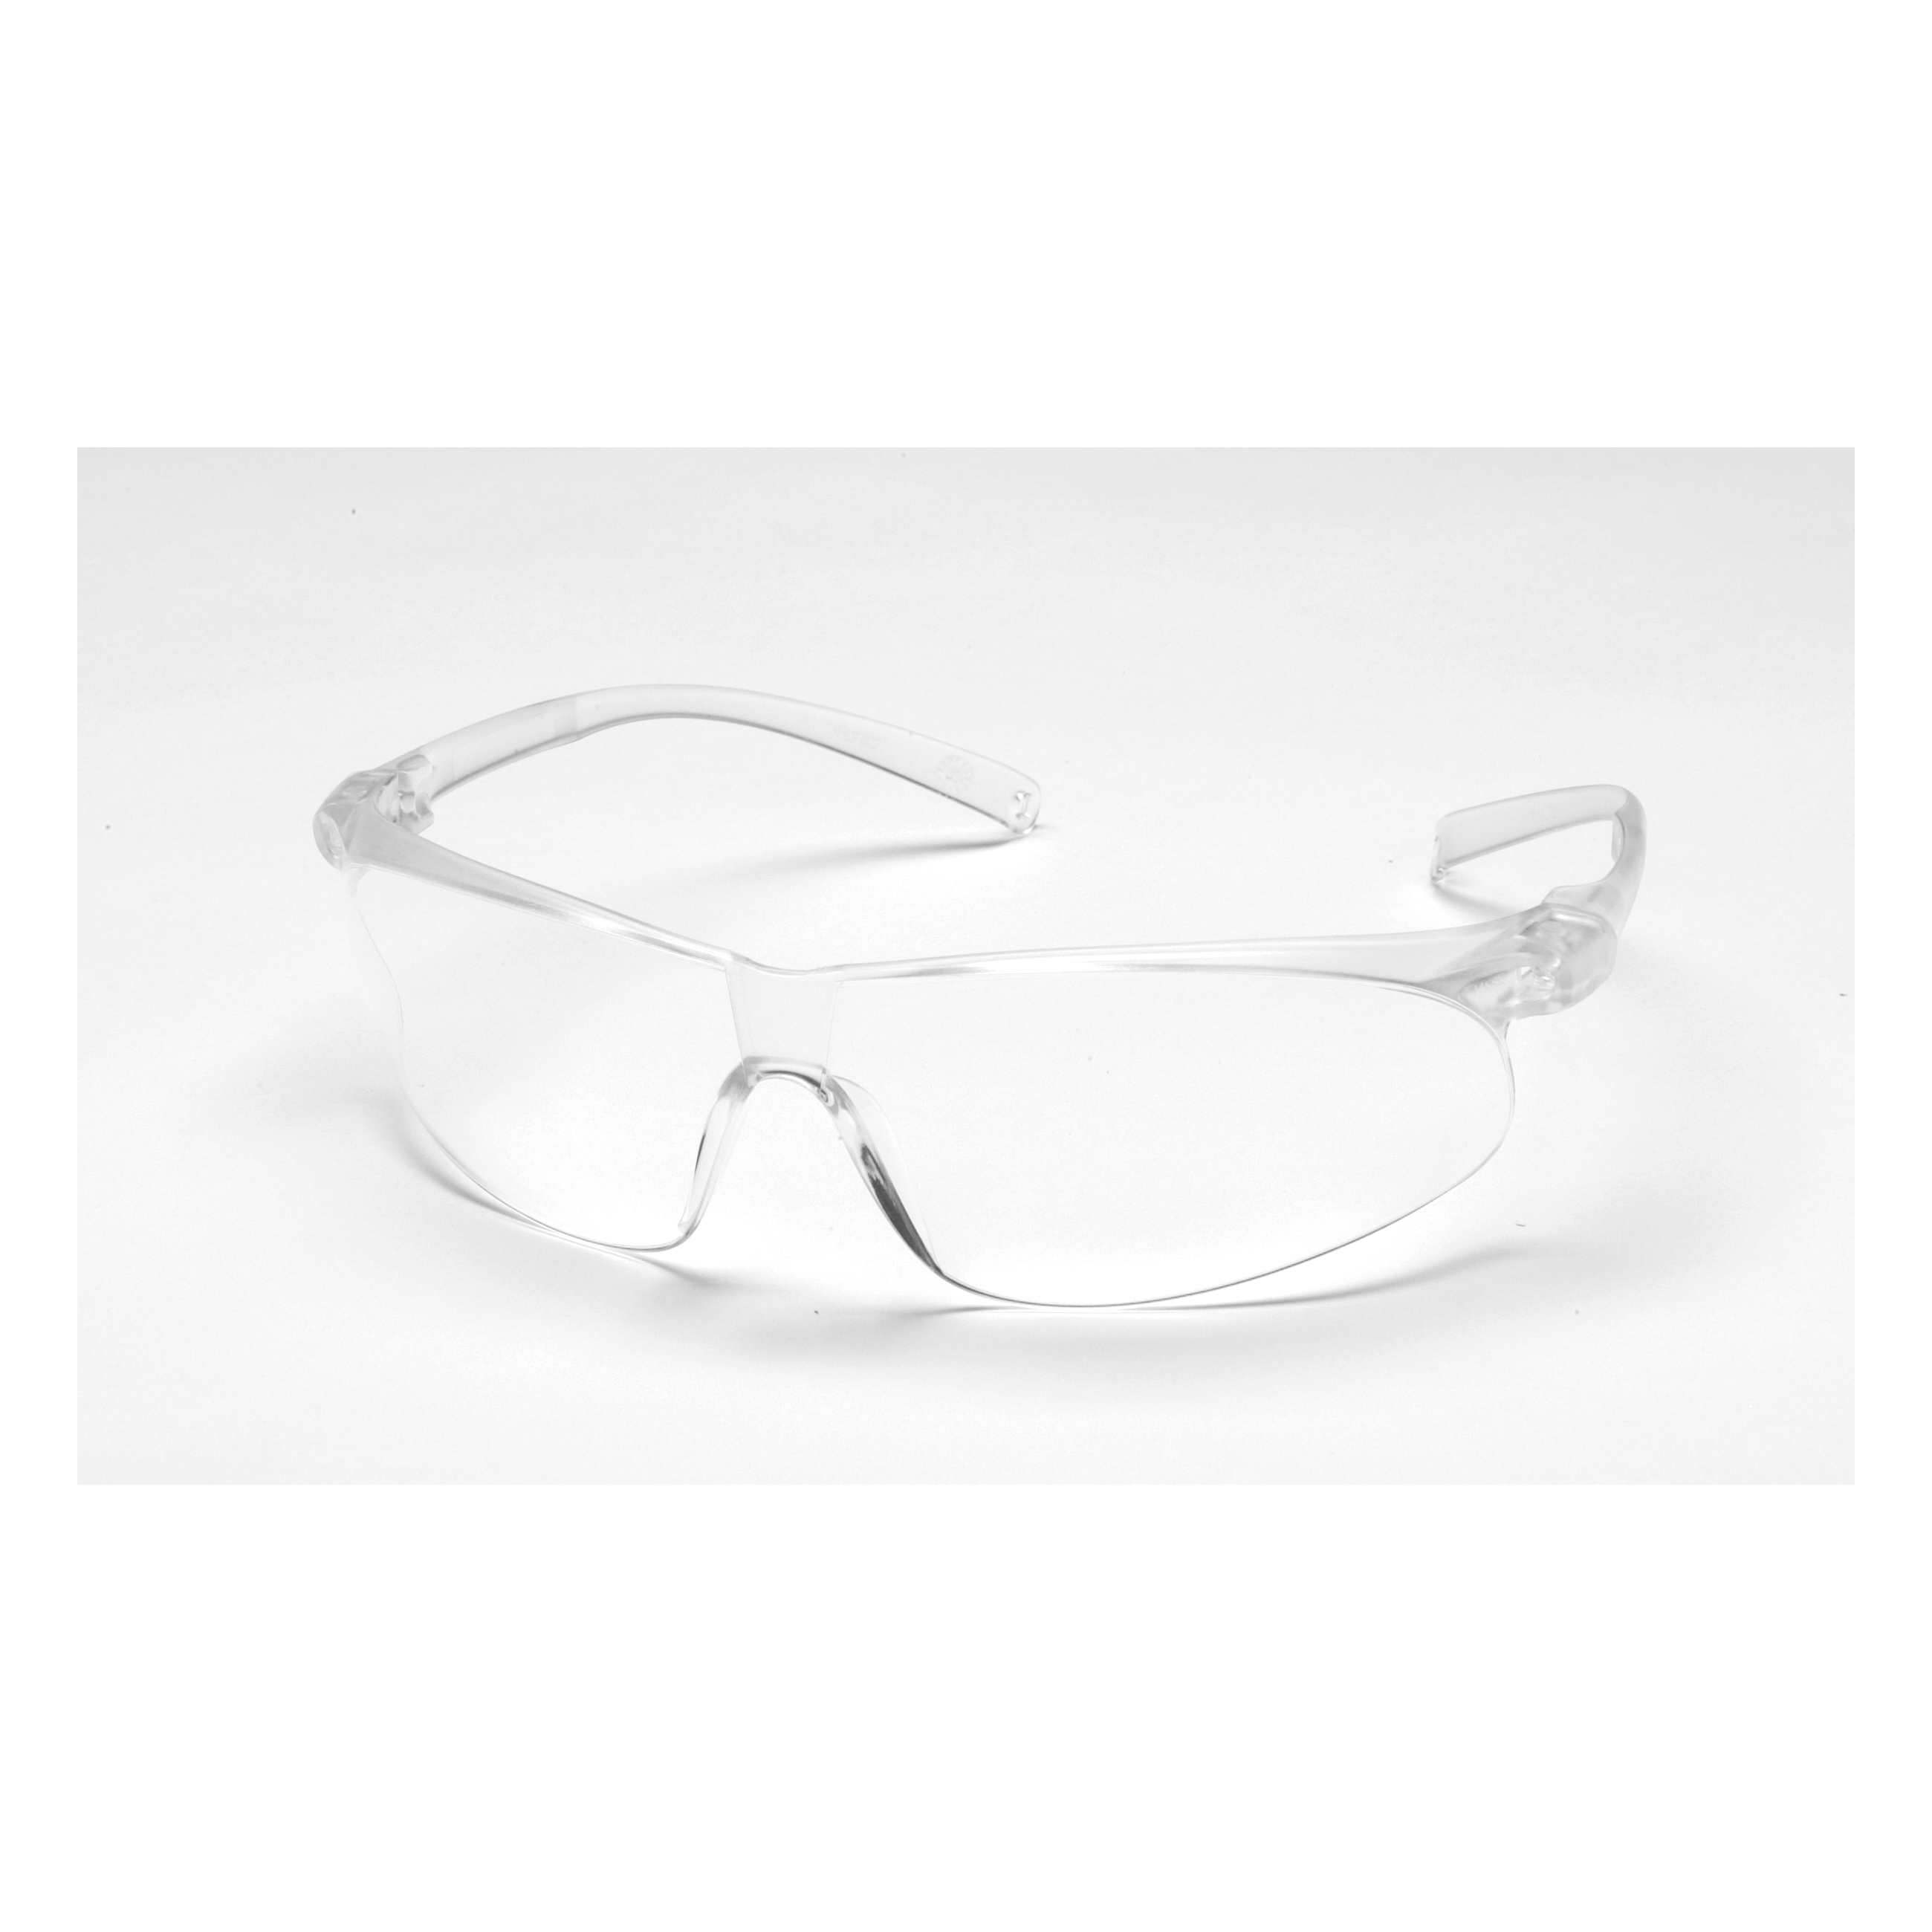 3M™ Virtua™ 078371-62054 Economy Lightweight Protective Eyewear, Anti-Fog Clear Lens, Frameless Clear Frame, Polycarbonate Lens, Specifications Met: ANSI Z87.1-2015, CSA Z94.3-2007